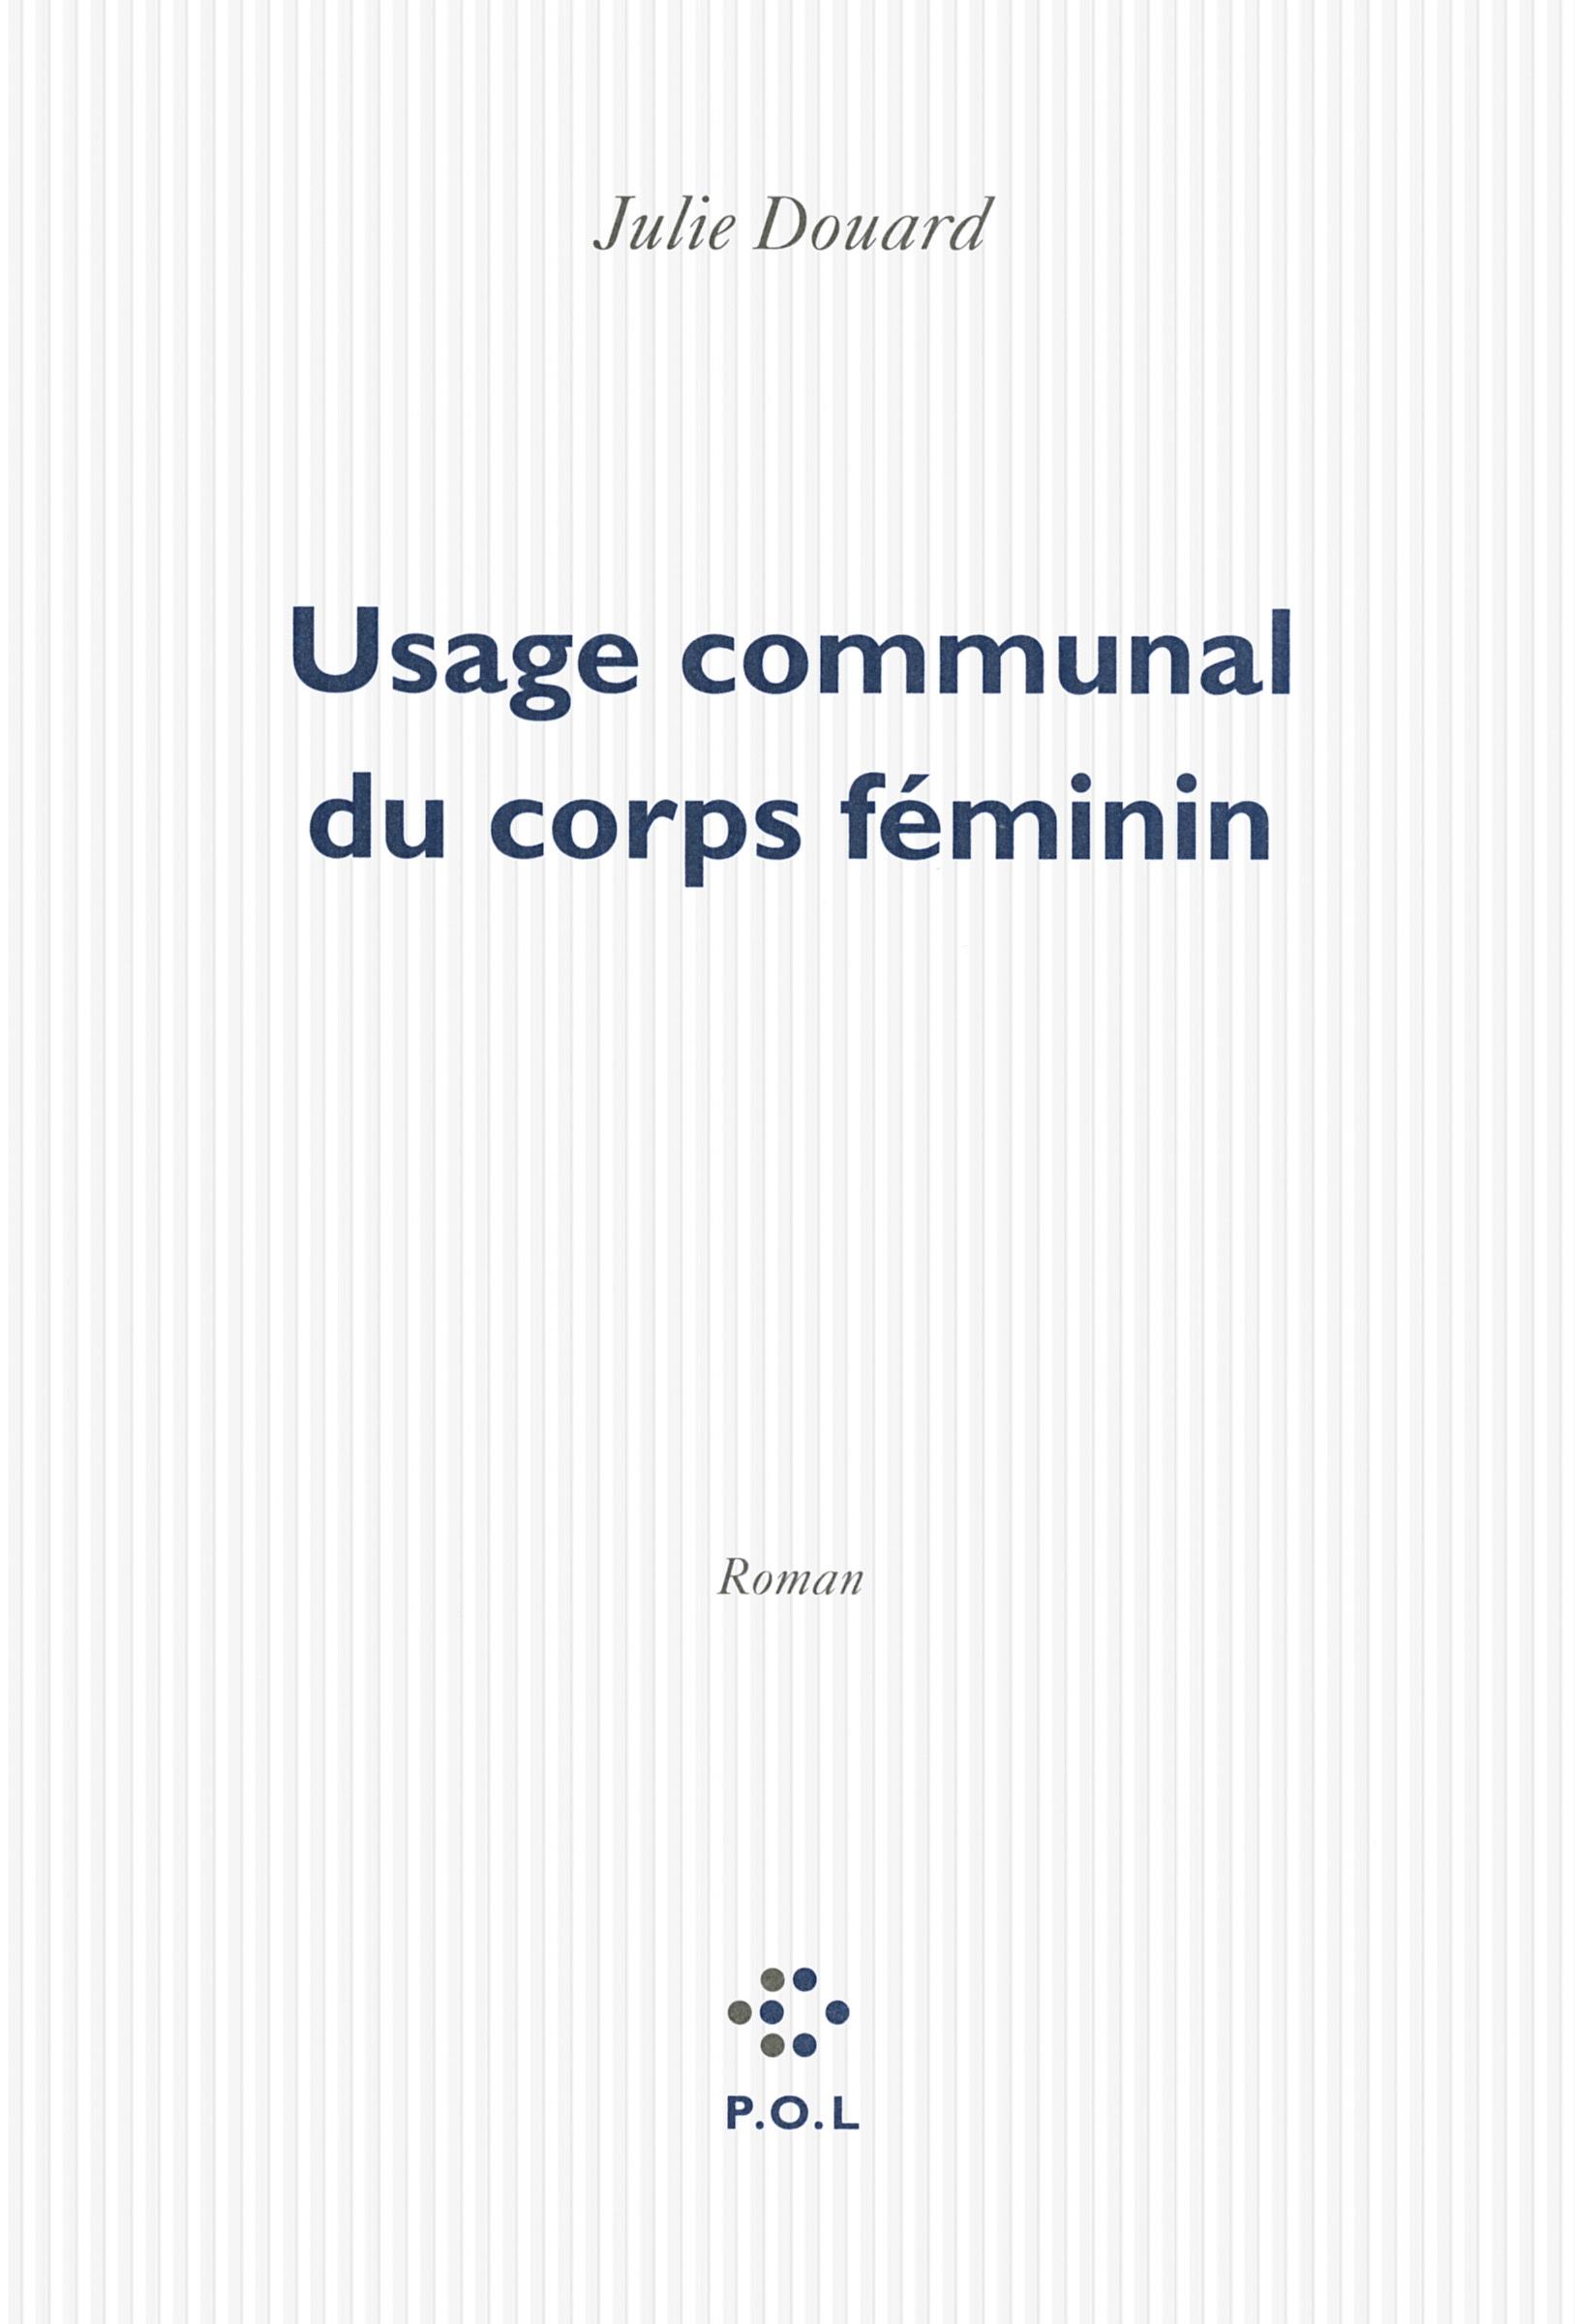 USAGE COMMUNAL DU CORPS FEMININ